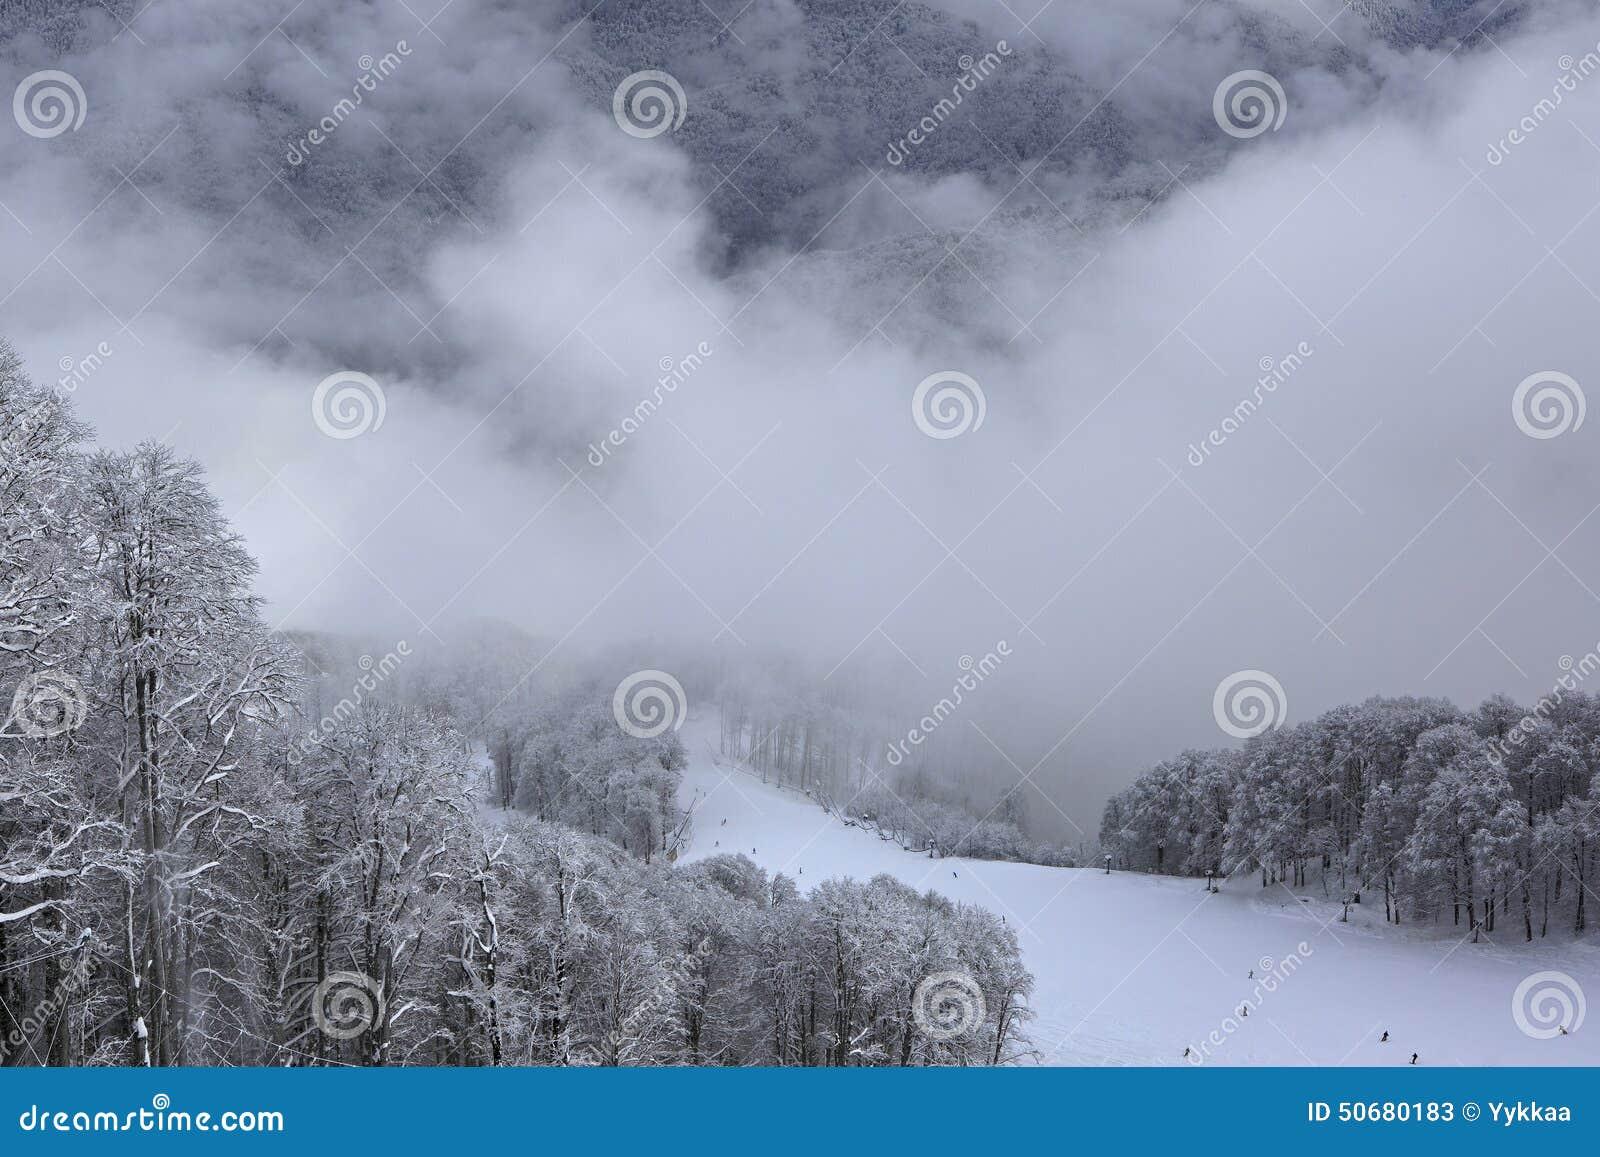 Download 美丽的积雪覆盖的高加索山脉 库存图片. 图片 包括有 旅游业, 俄国, 体育运动, 横向, 休闲, 本质 - 50680183